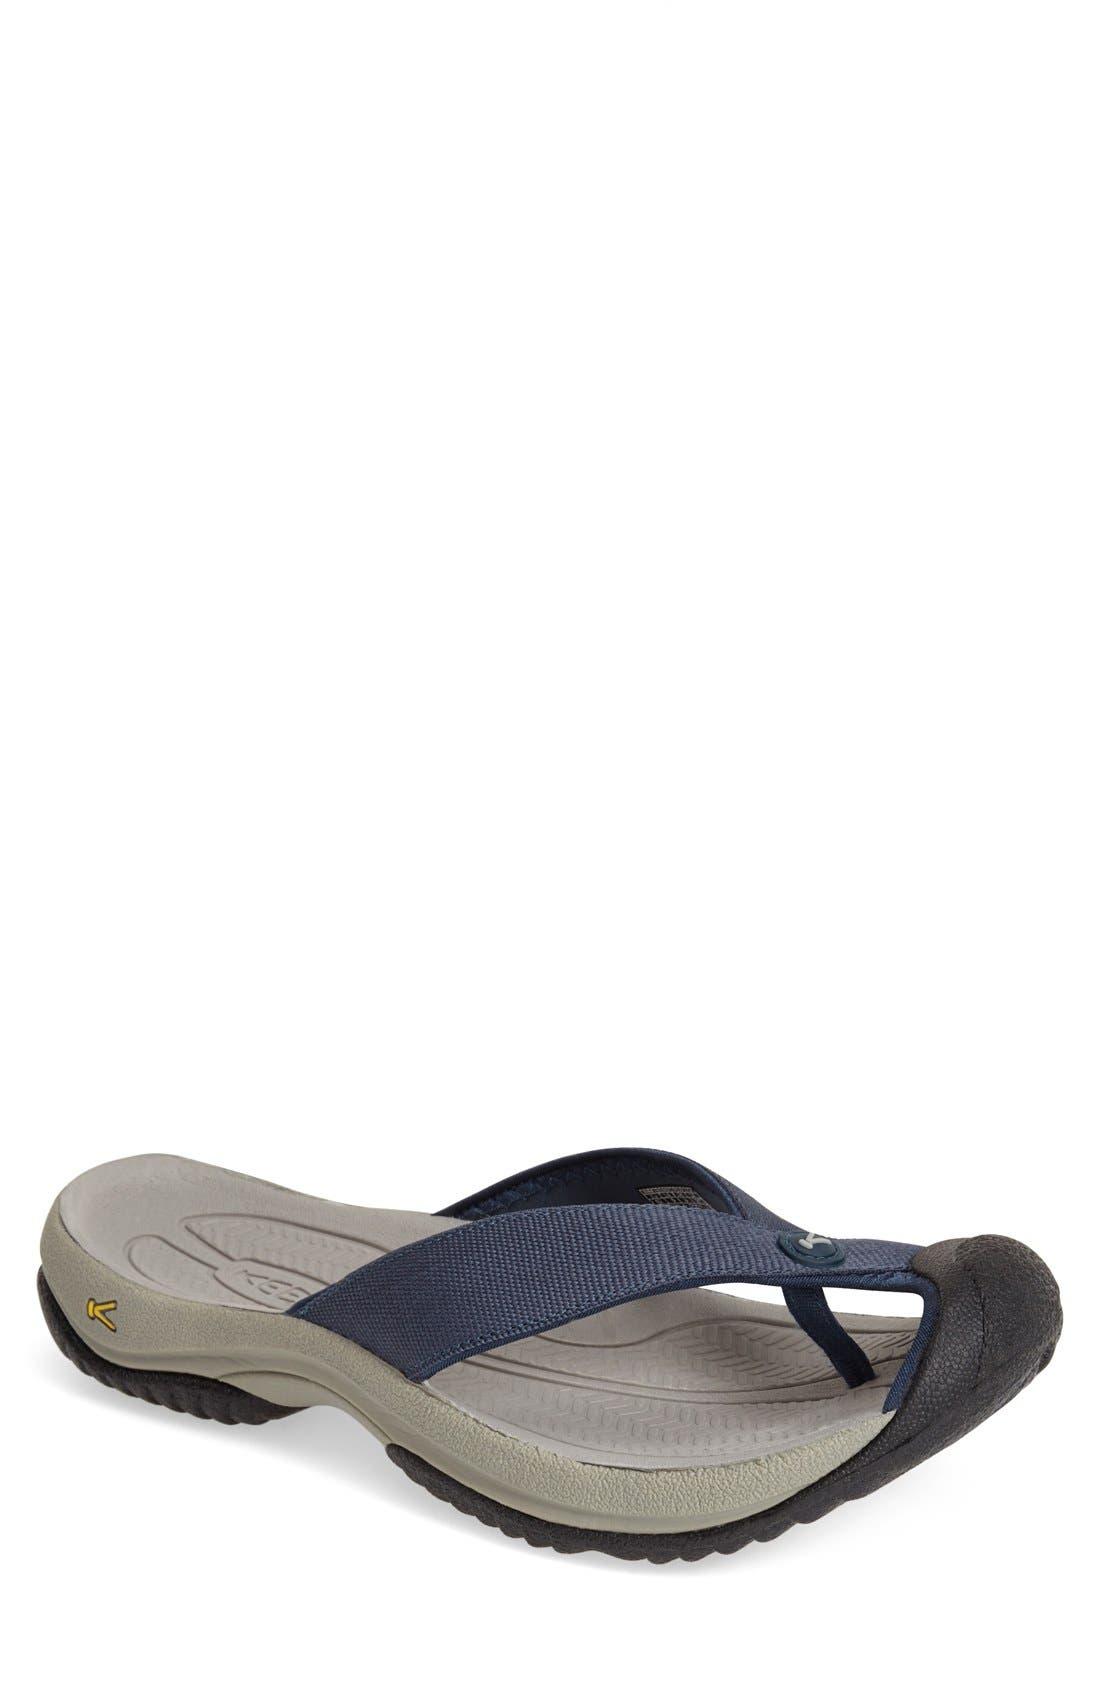 'Waimea H2' Water Thong Sandal,                         Main,                         color, MIDNIGHT NAVY/ NEUTRAL